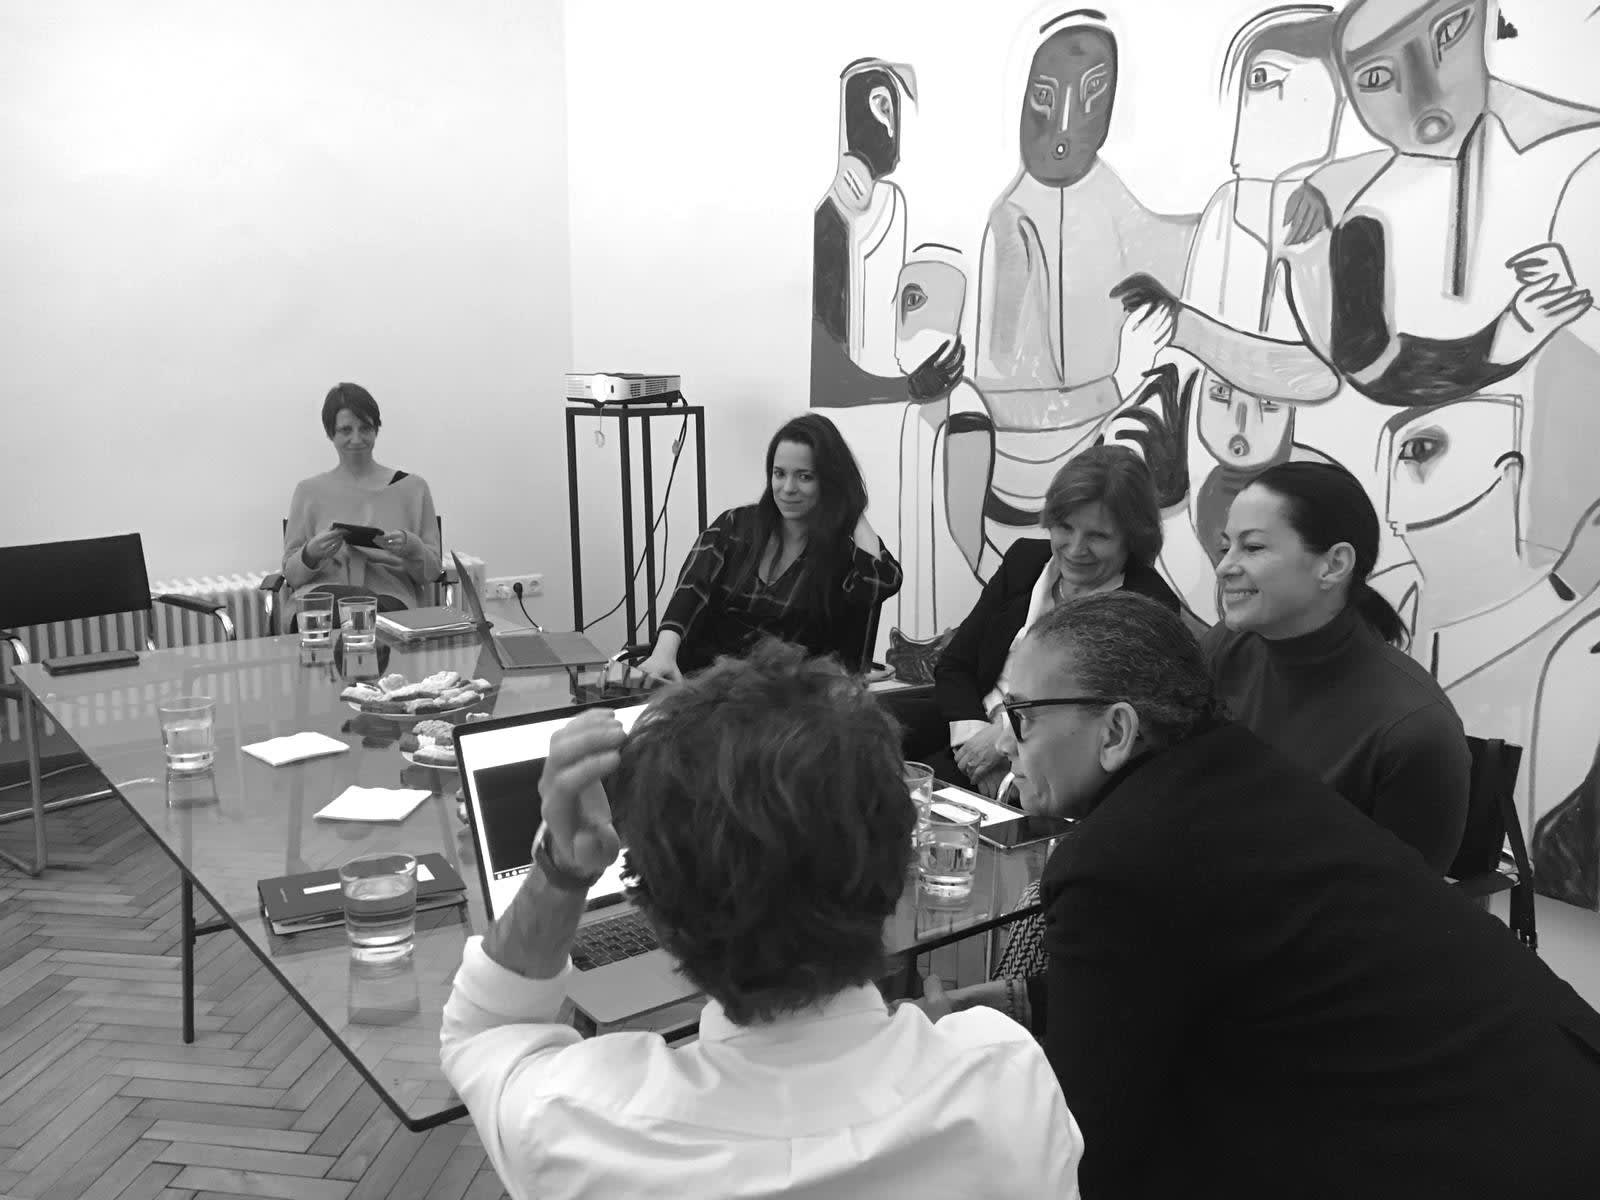 Meeting the artist Lubaina Himid at B.LA's Artspace & WwB's Headquarters.